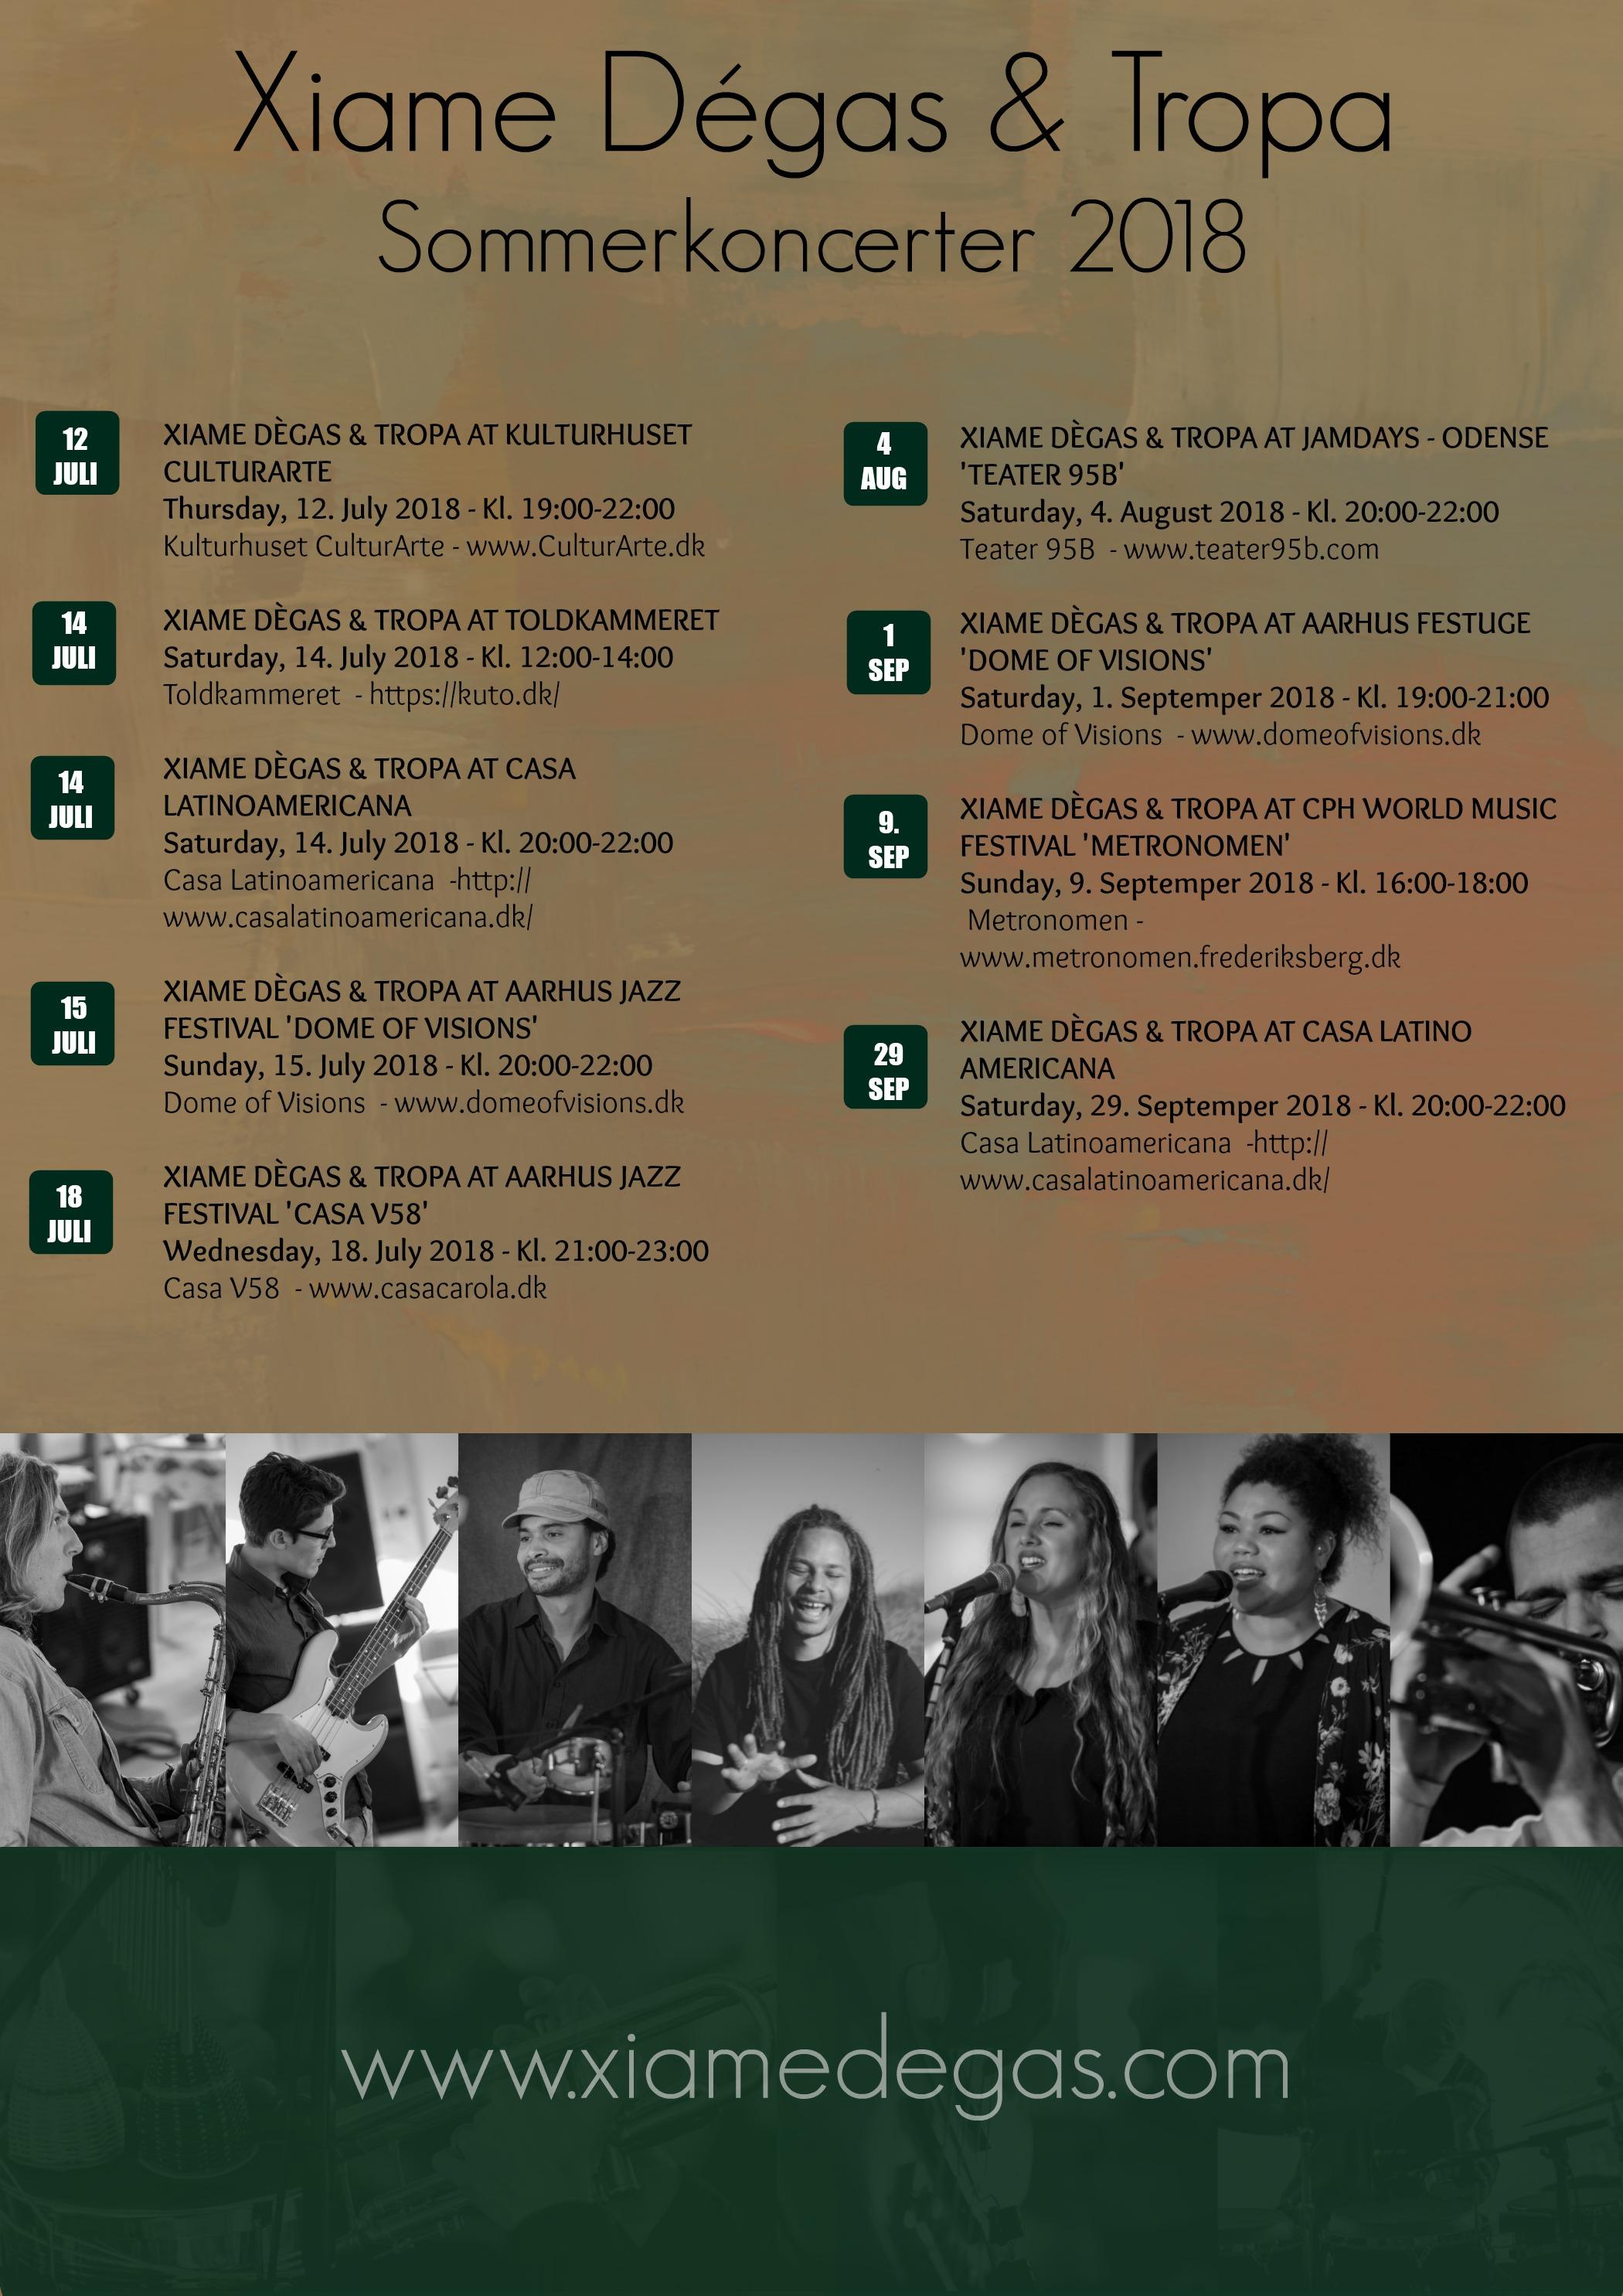 sommerkoncerter 2018 - tropa